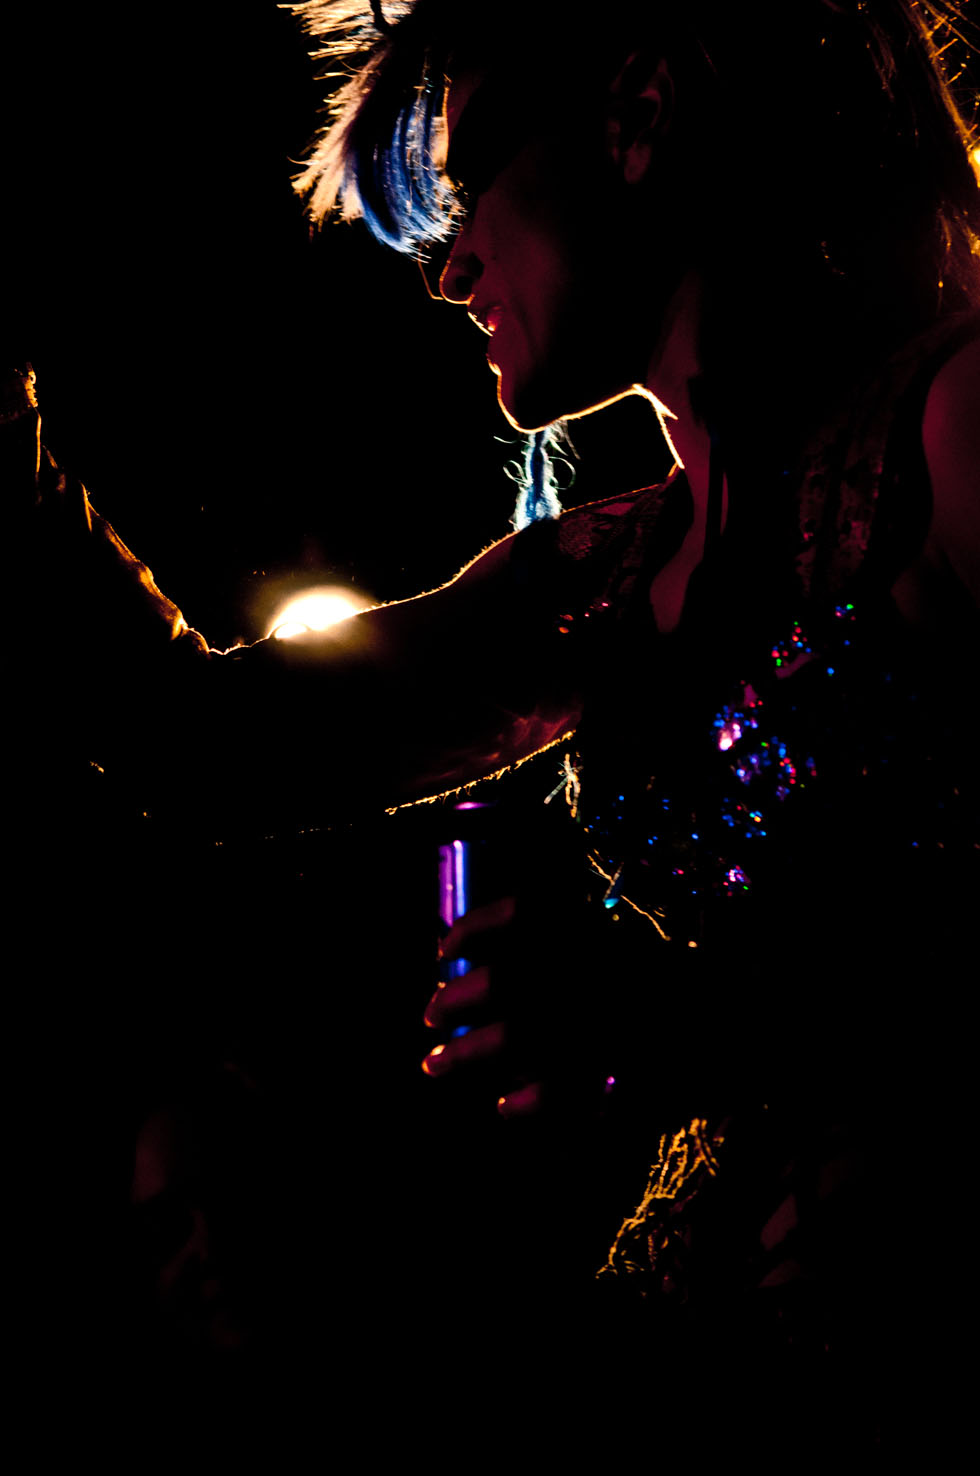 zum-schneider-nyc-2012-karneval-apocalyptika-3351.jpg